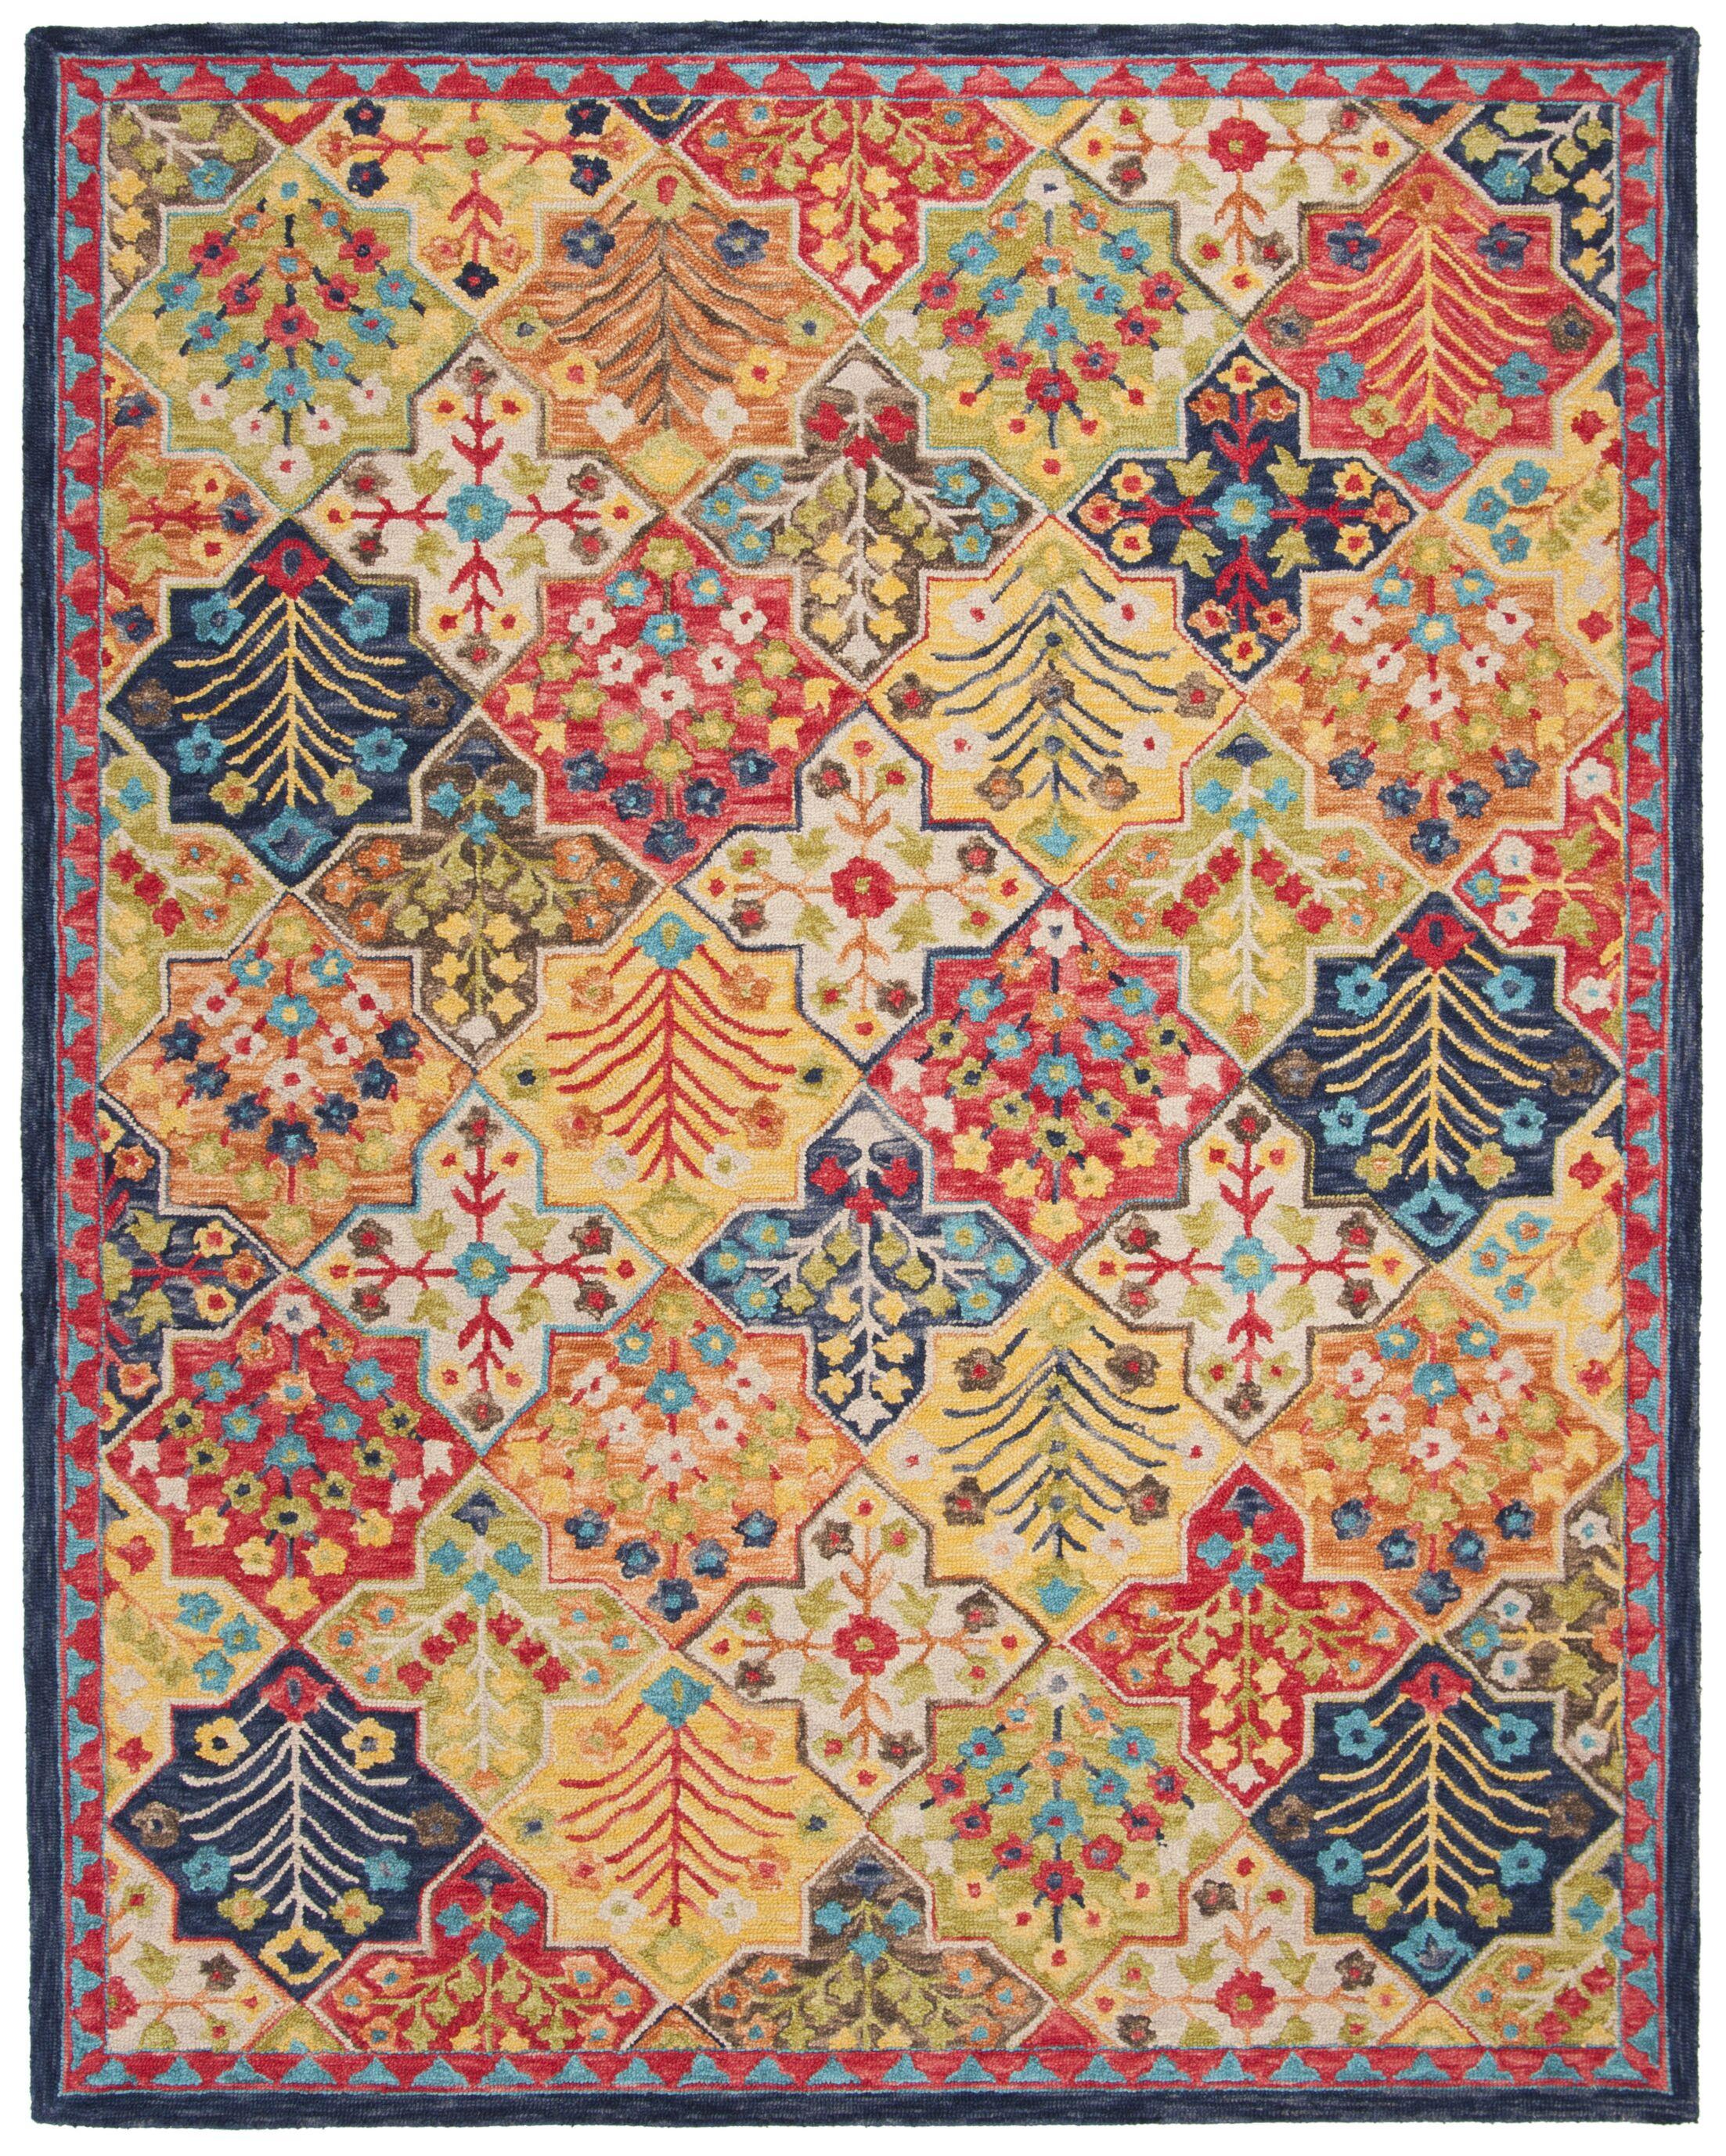 Poulin Hand-Tufted Wool Blue/Orange Area Rug Rug Size: Rectangle 8' X 10'